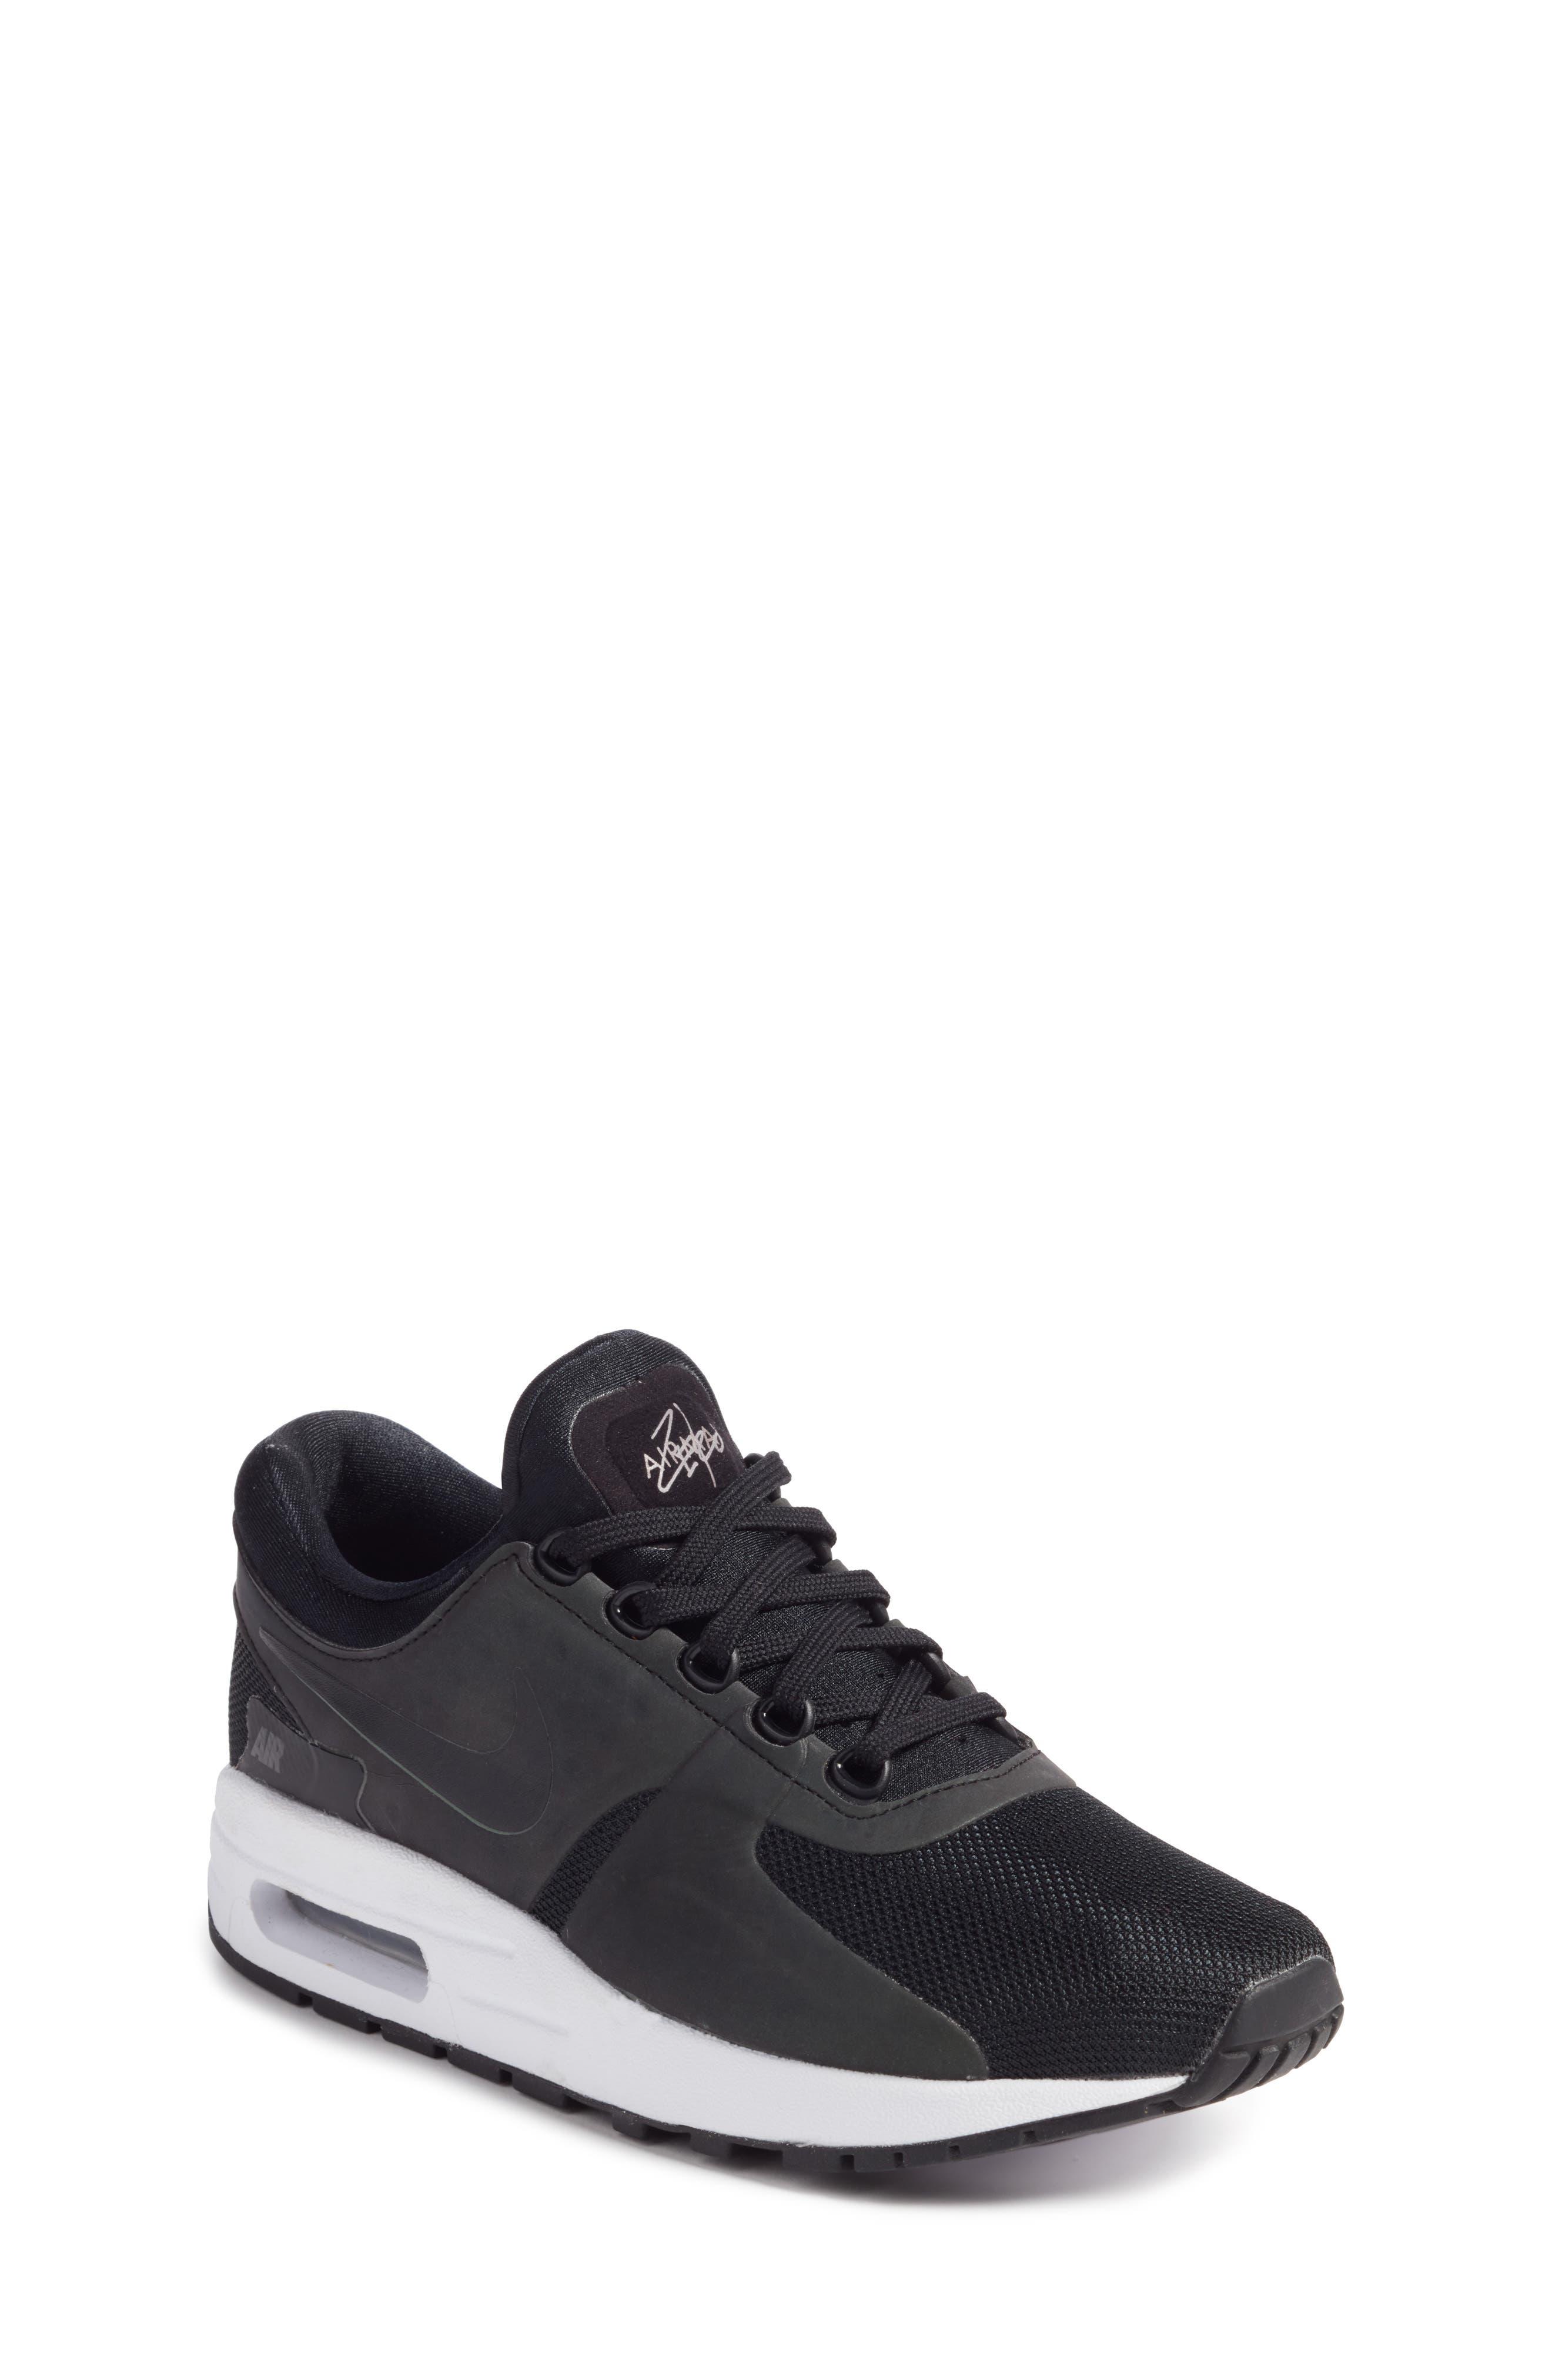 Air Max Zero Sneaker,                             Main thumbnail 1, color,